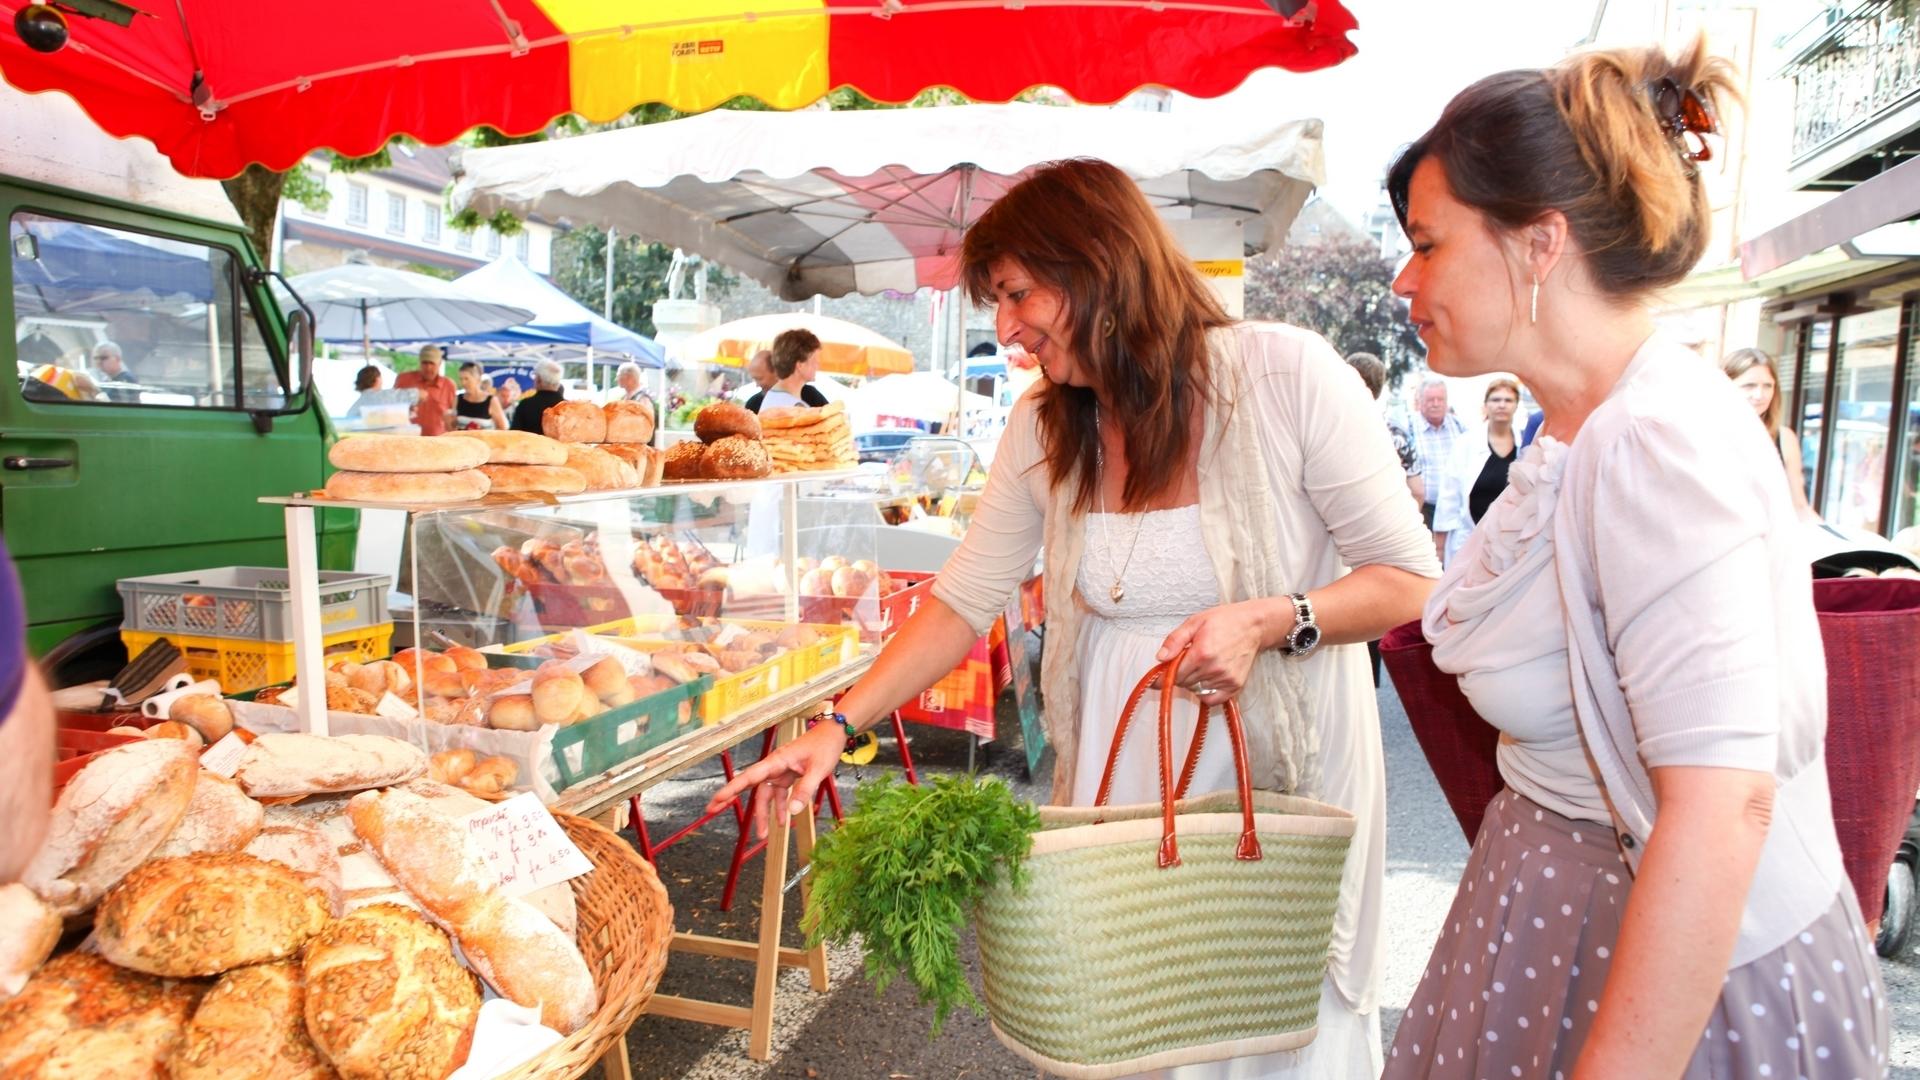 Samstagsmarktes in Bulle